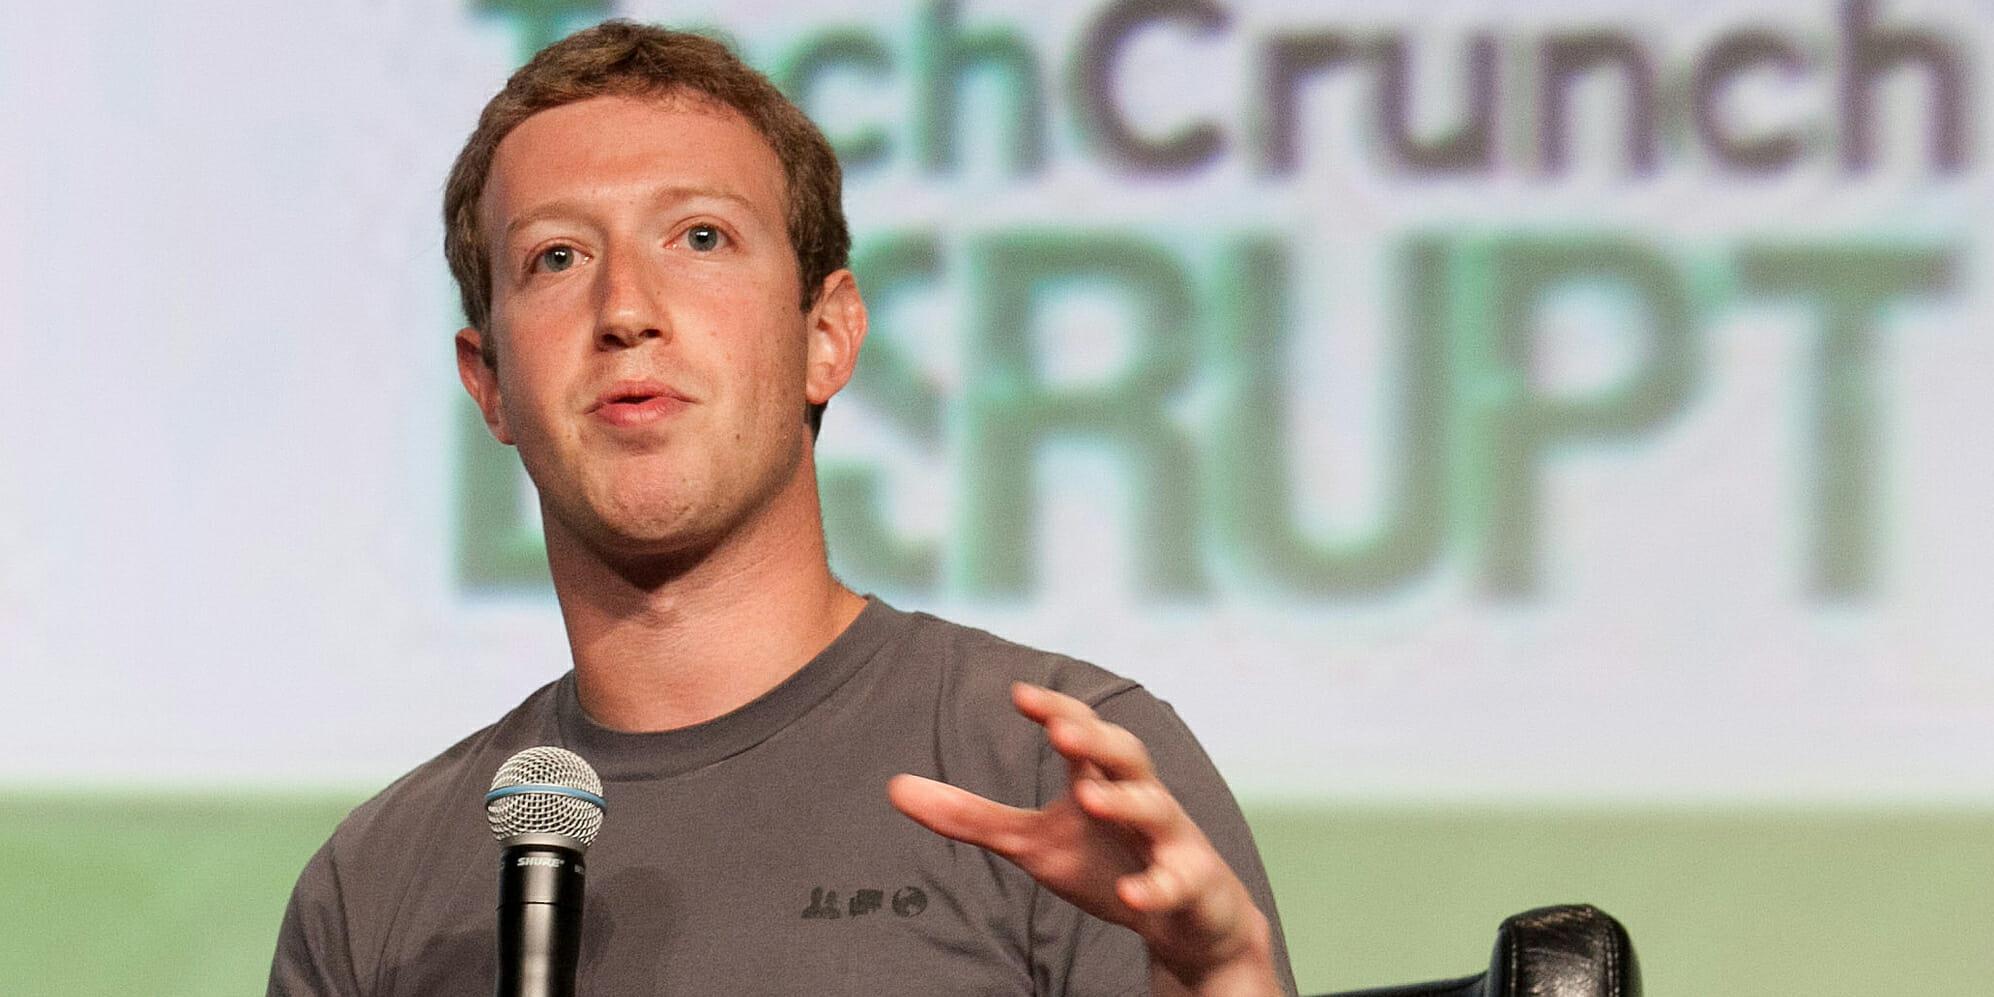 Flipboard Mark Zuckerberg Says He Wants Stricter European Style Privacy Laws